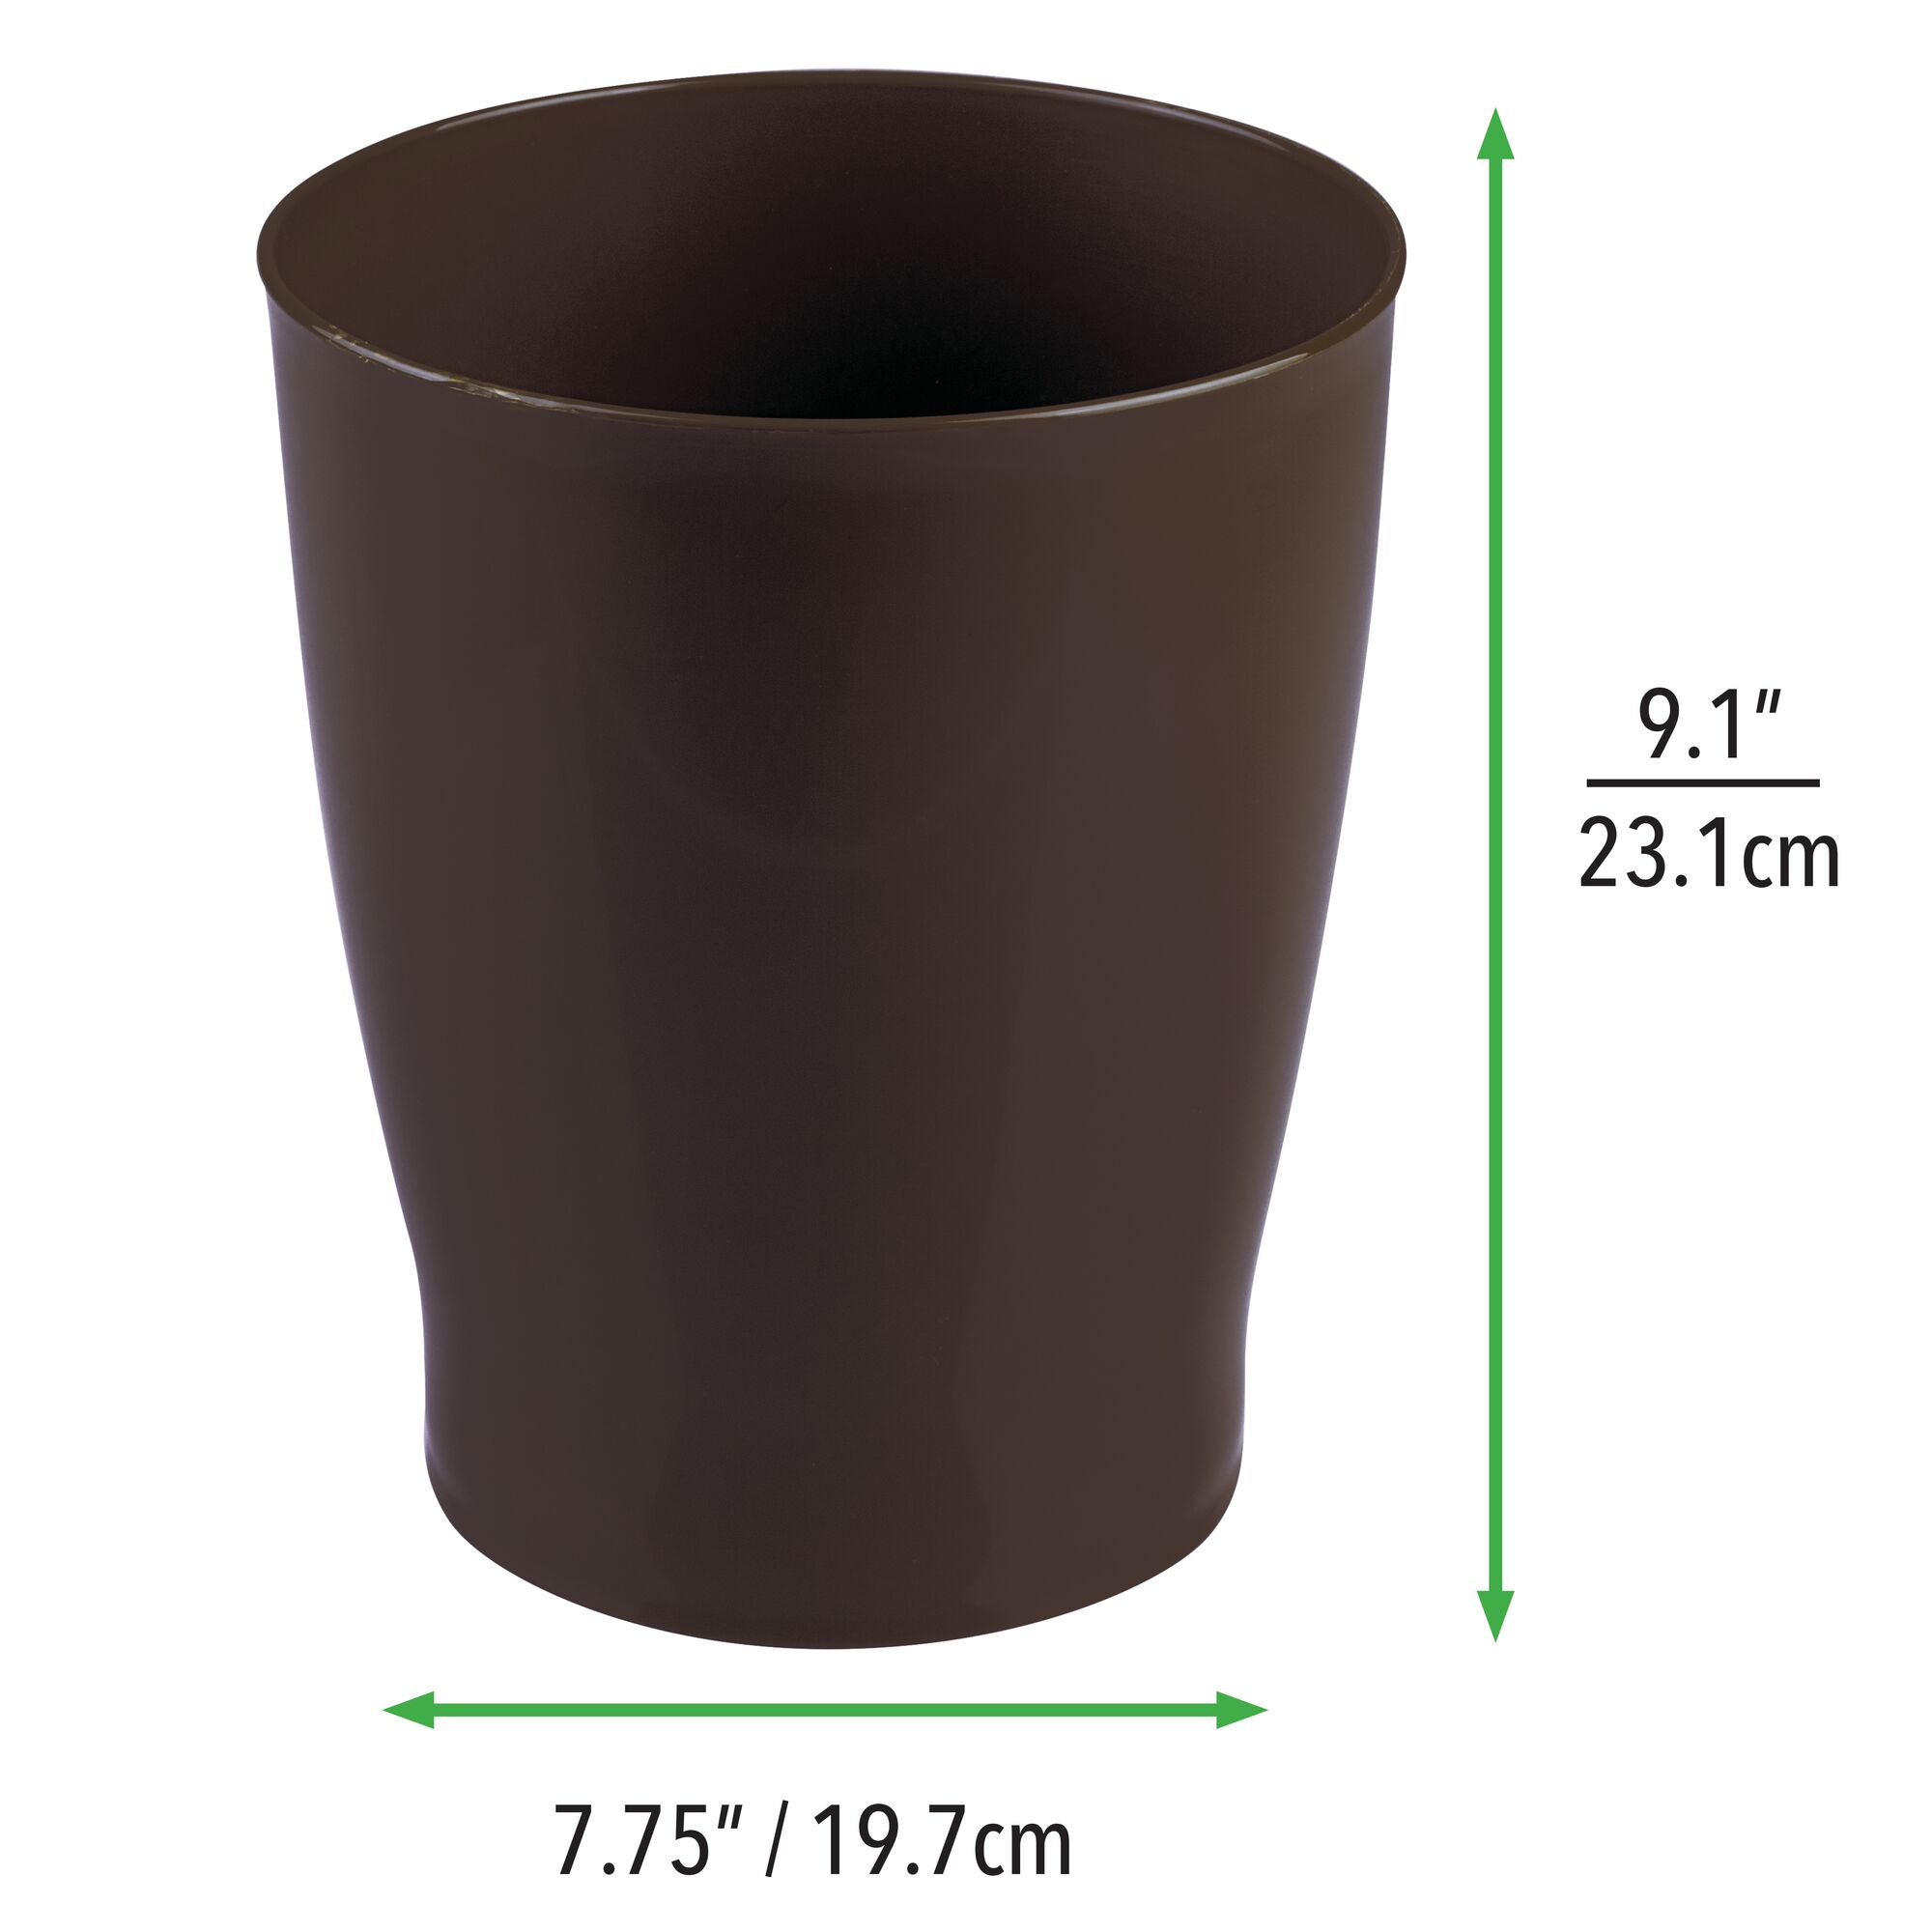 mDesign Slim Plastic Small Round Trash Can Wastebasket Garbage Bin